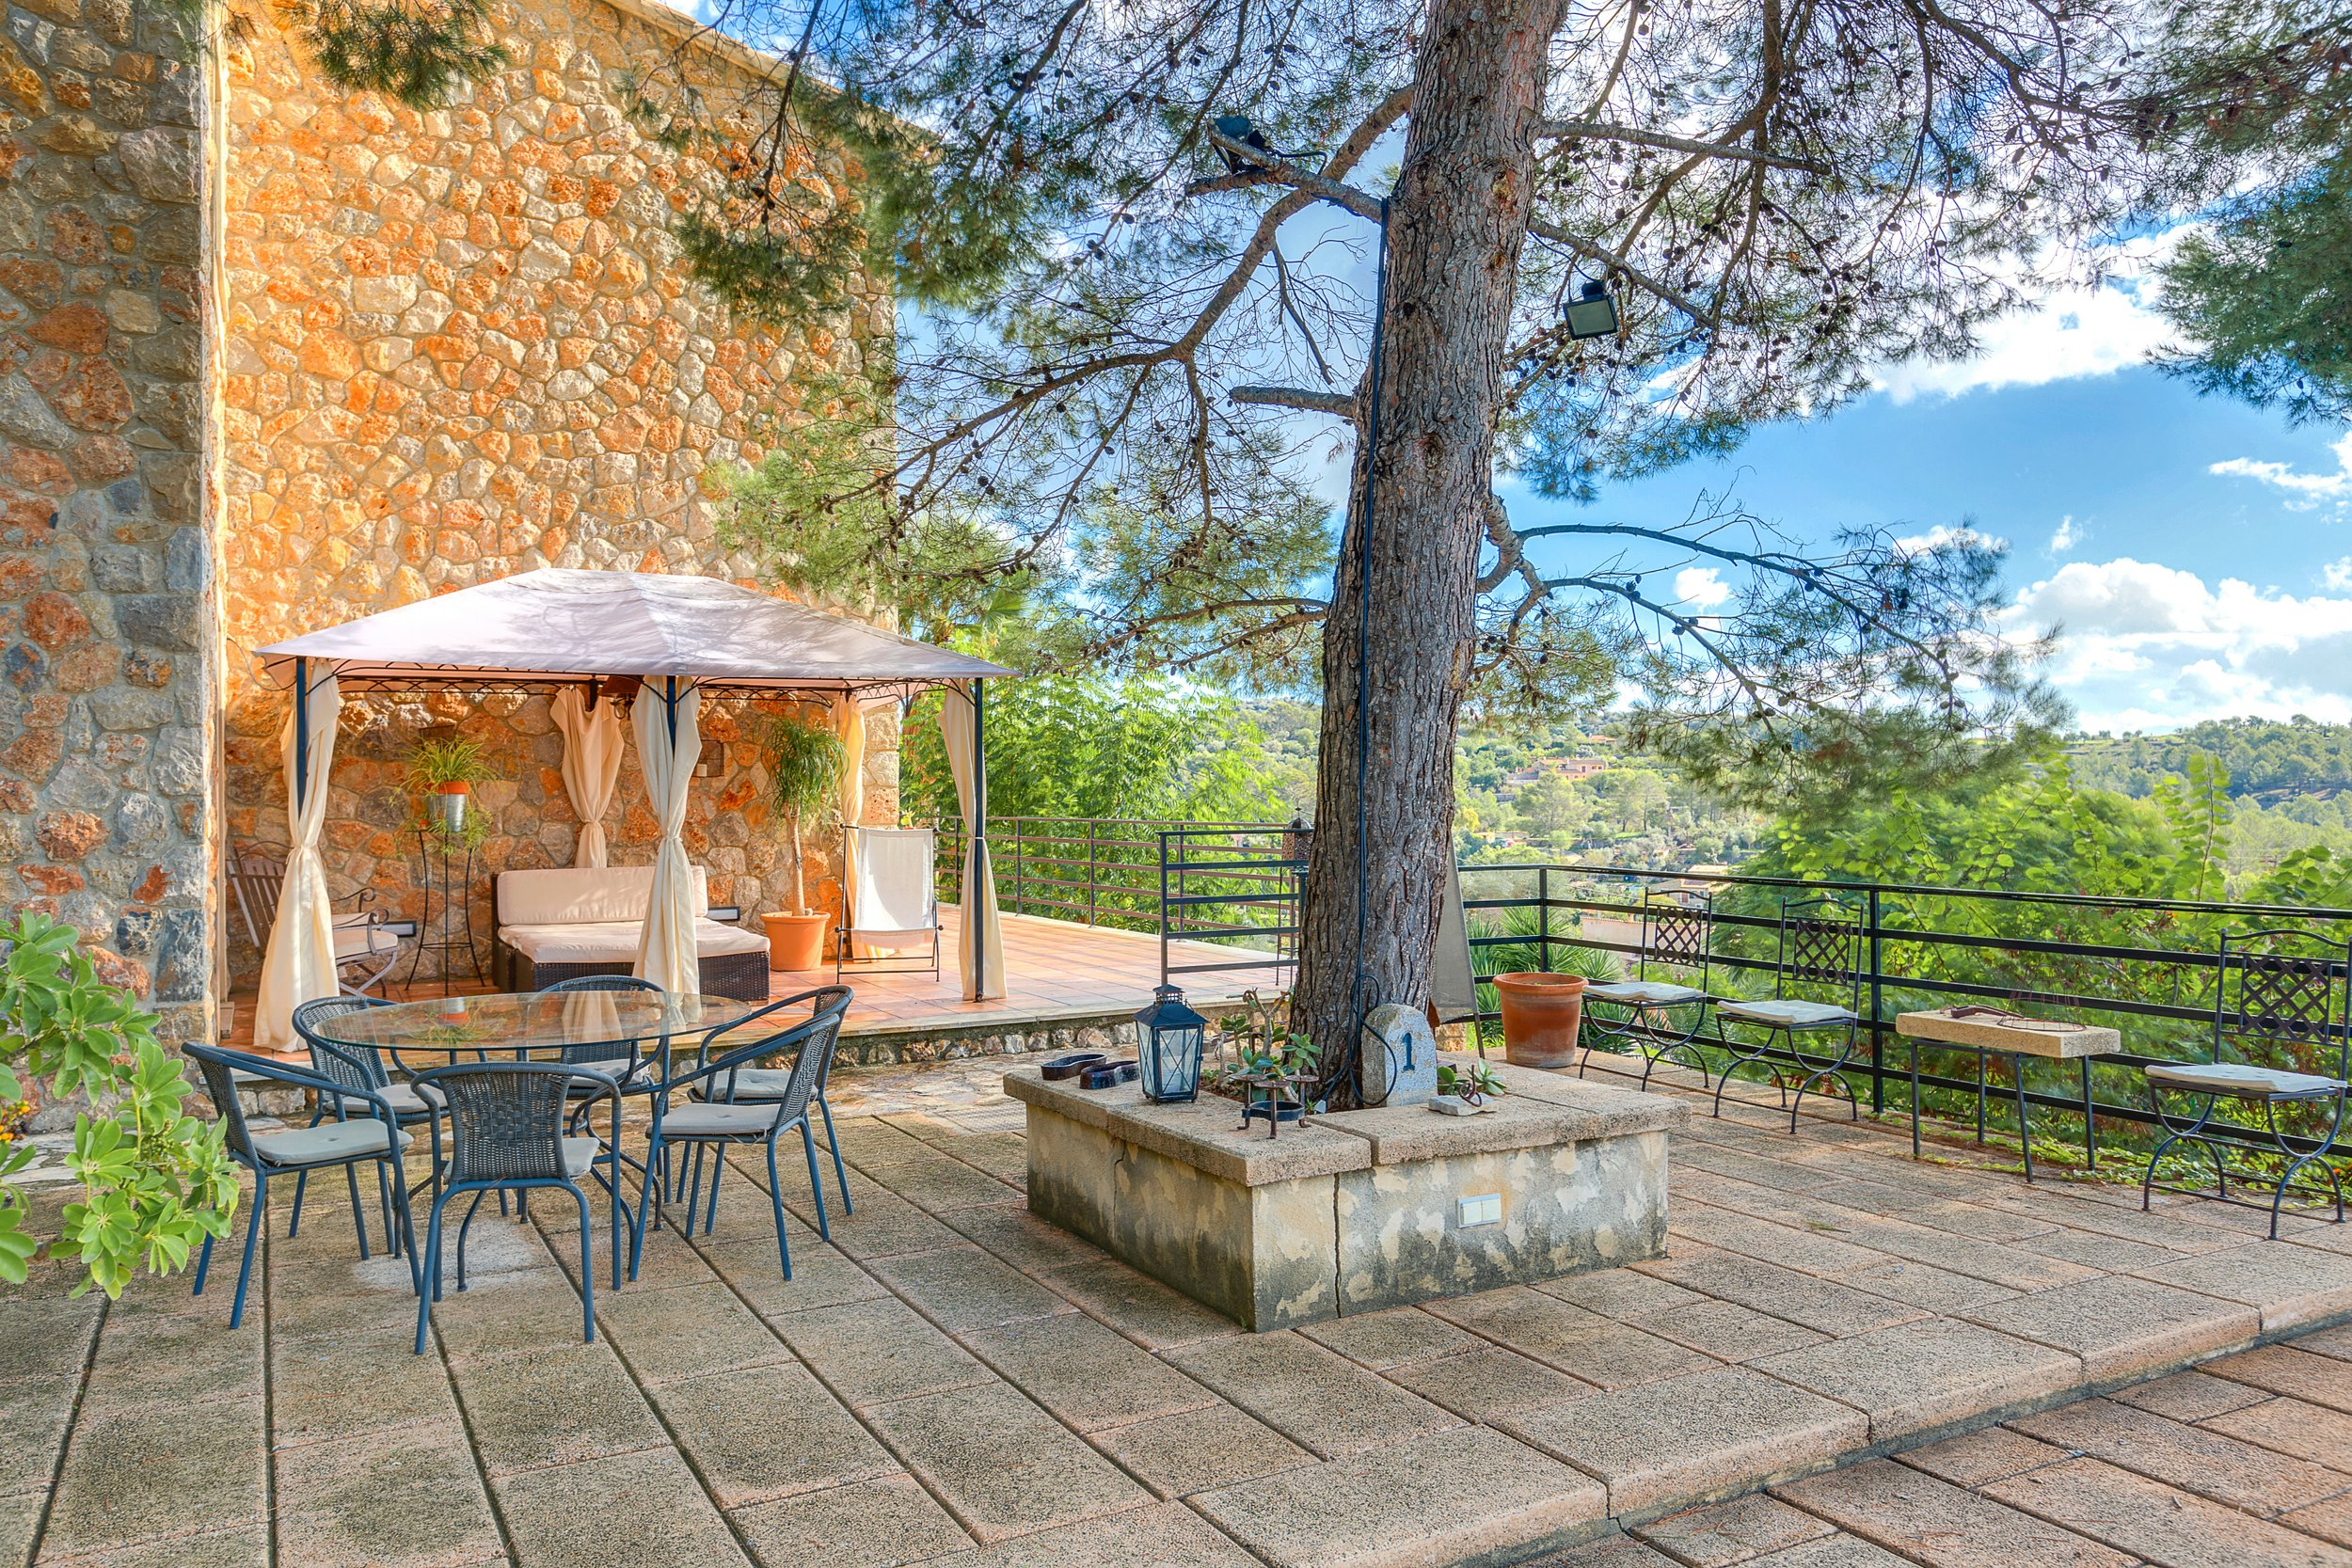 Maison de vacances Villa Cirera in Alaro (2611793), Alaro, Majorque, Iles Baléares, Espagne, image 9